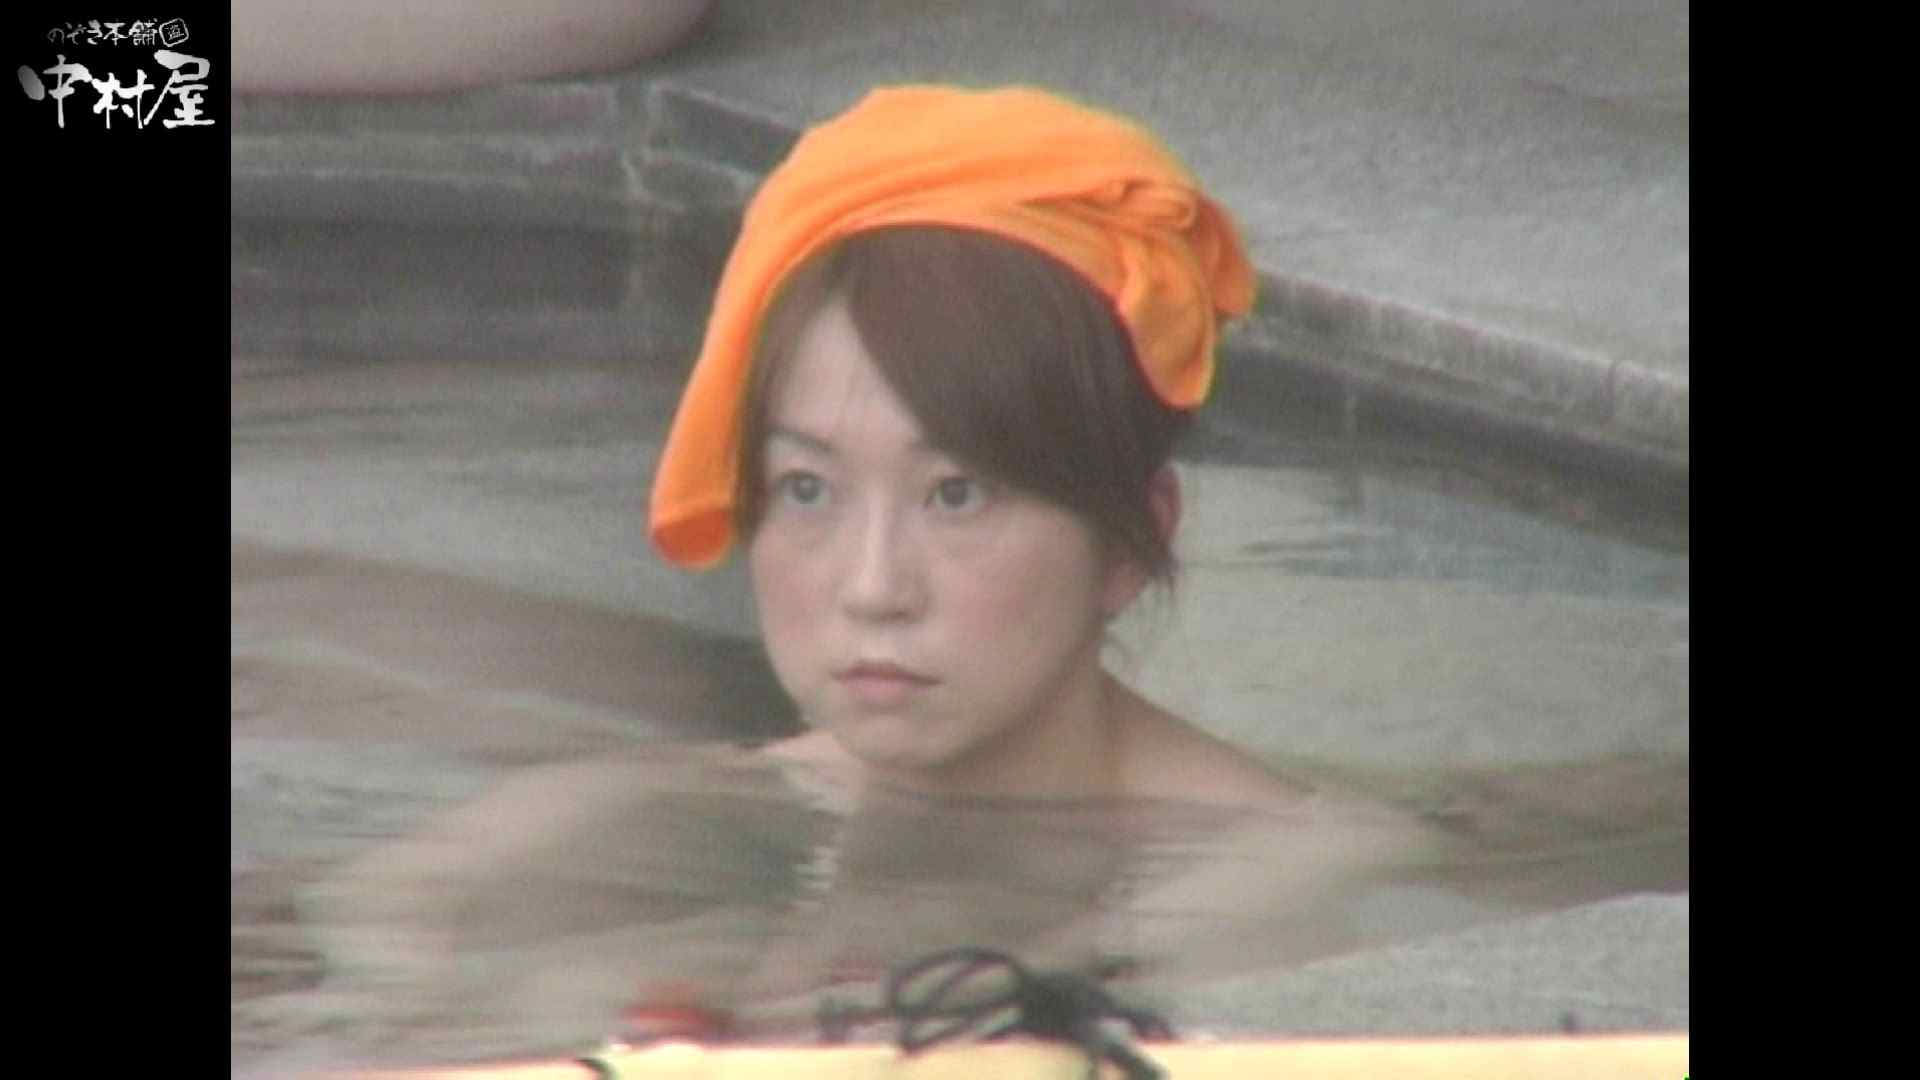 Aquaな露天風呂Vol.941 OLセックス  49画像 39